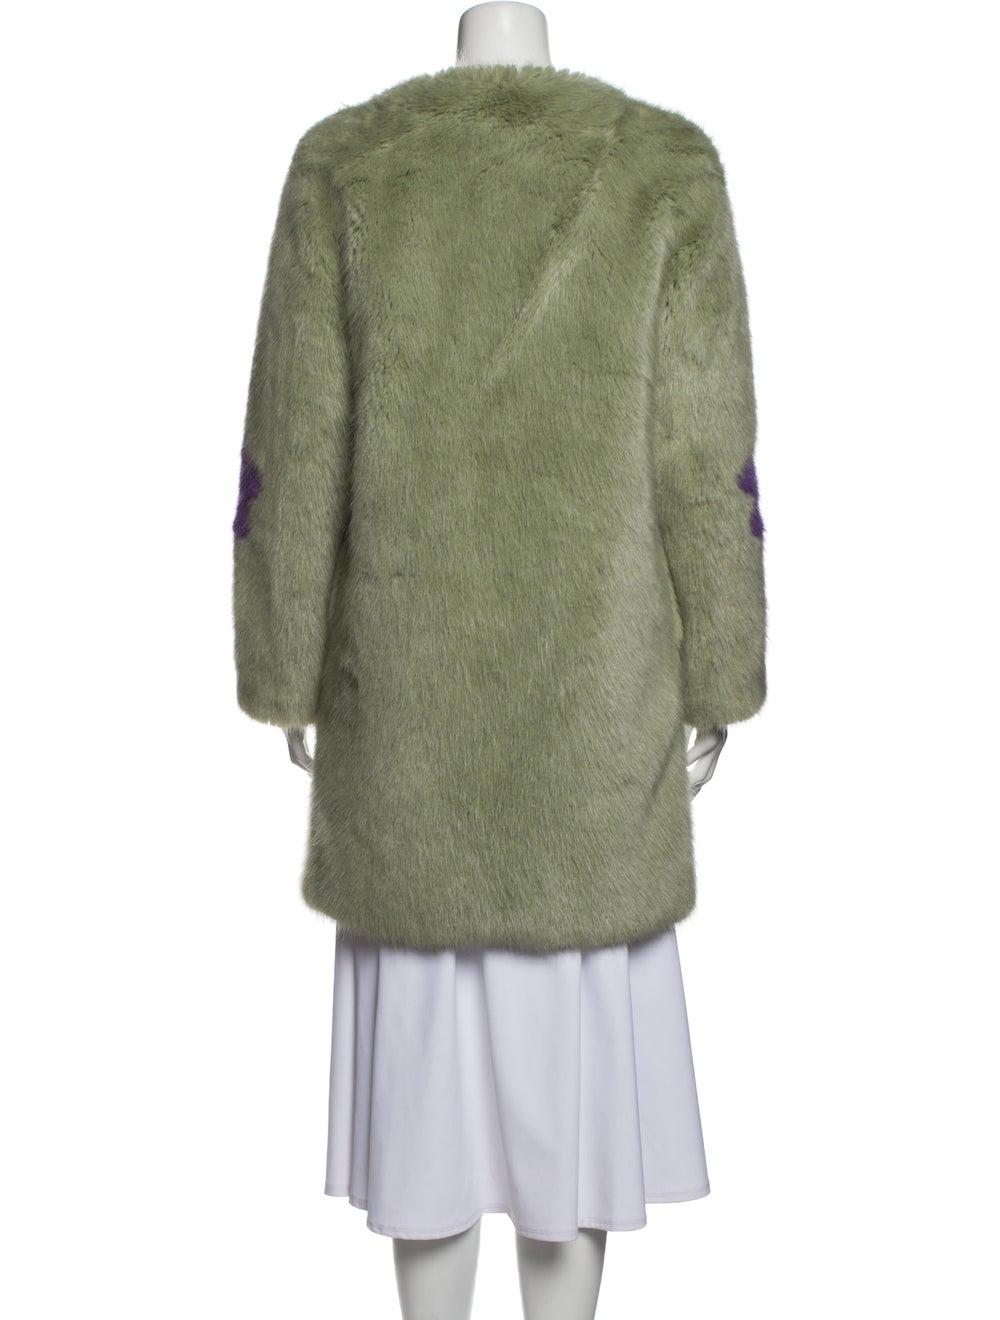 Shrimps Patterned Faux Fur Coat Green - image 3